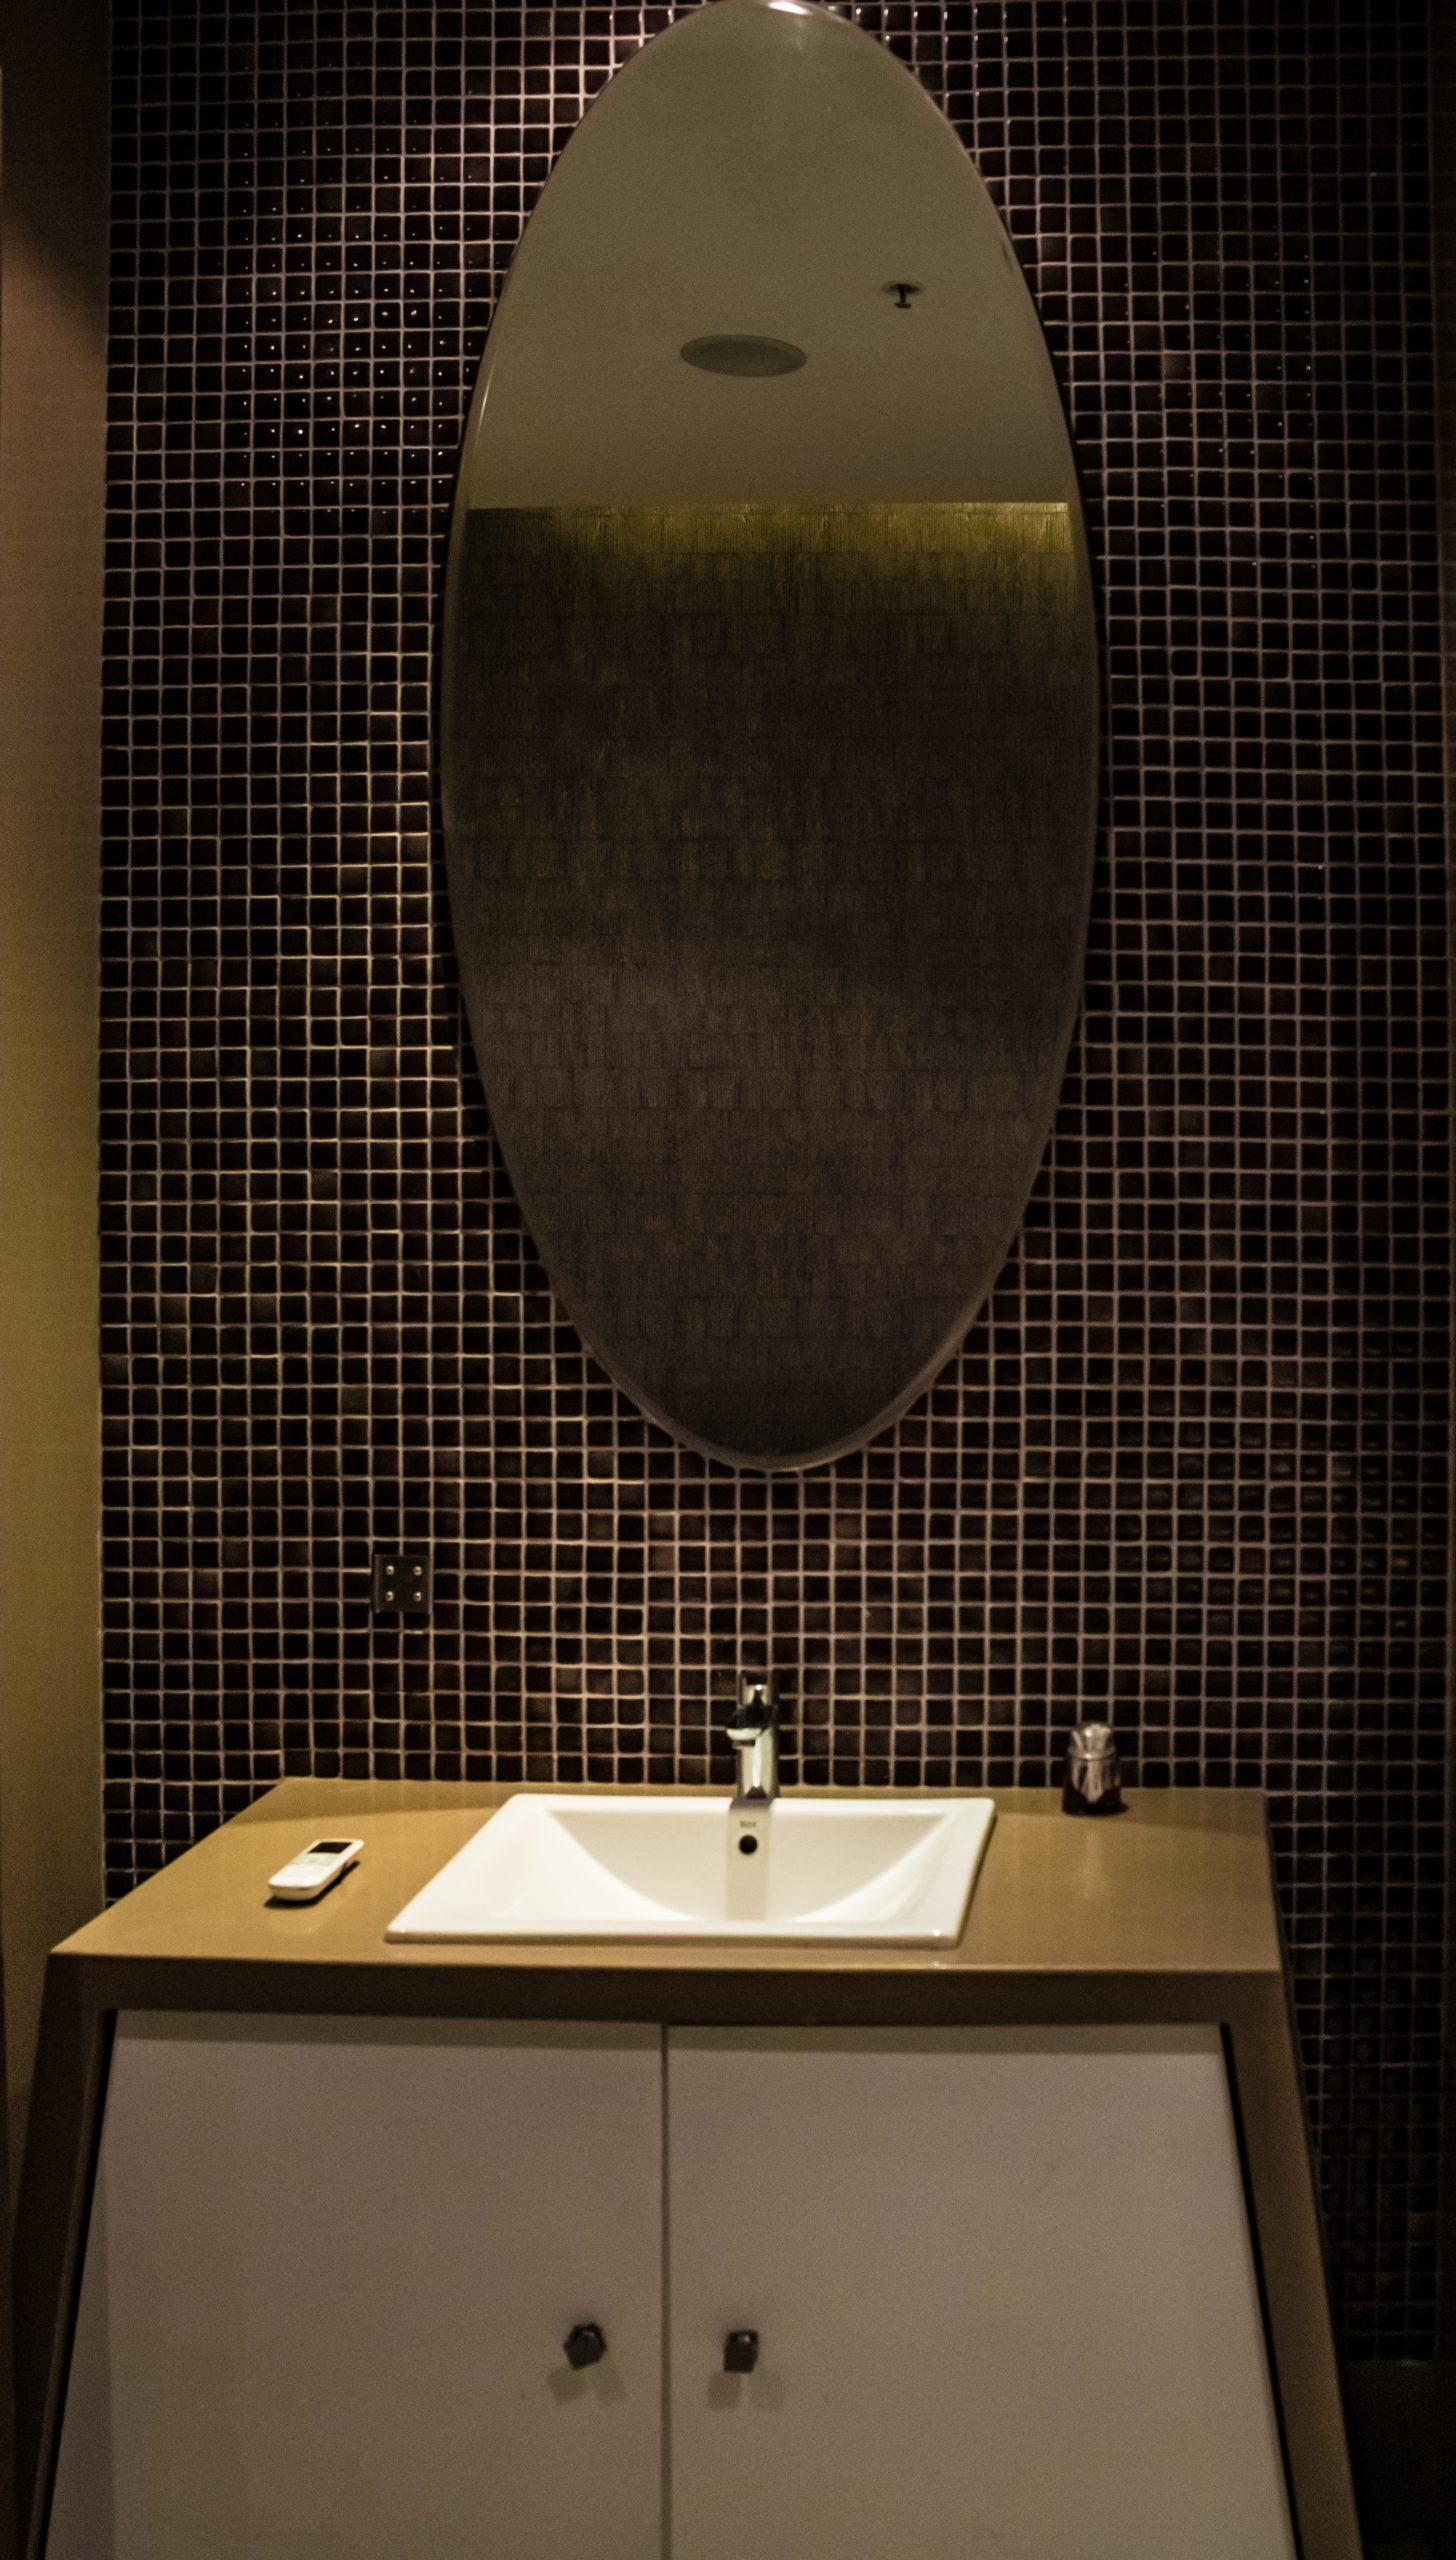 Wash basin and mirror